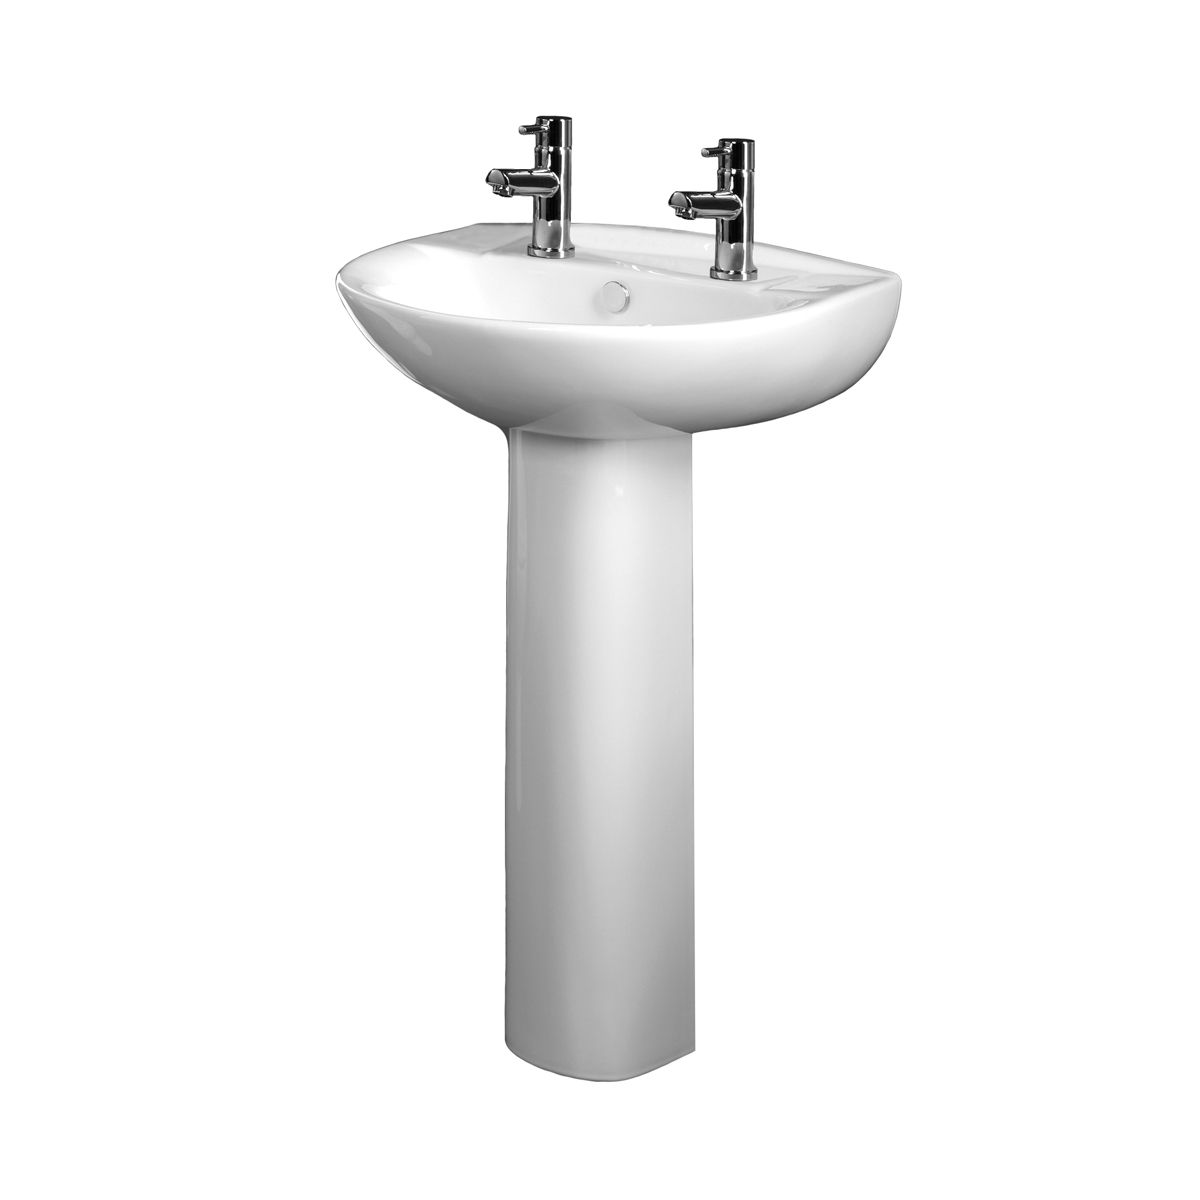 tavistock micra 2 tap hole basin pedestal 565mm